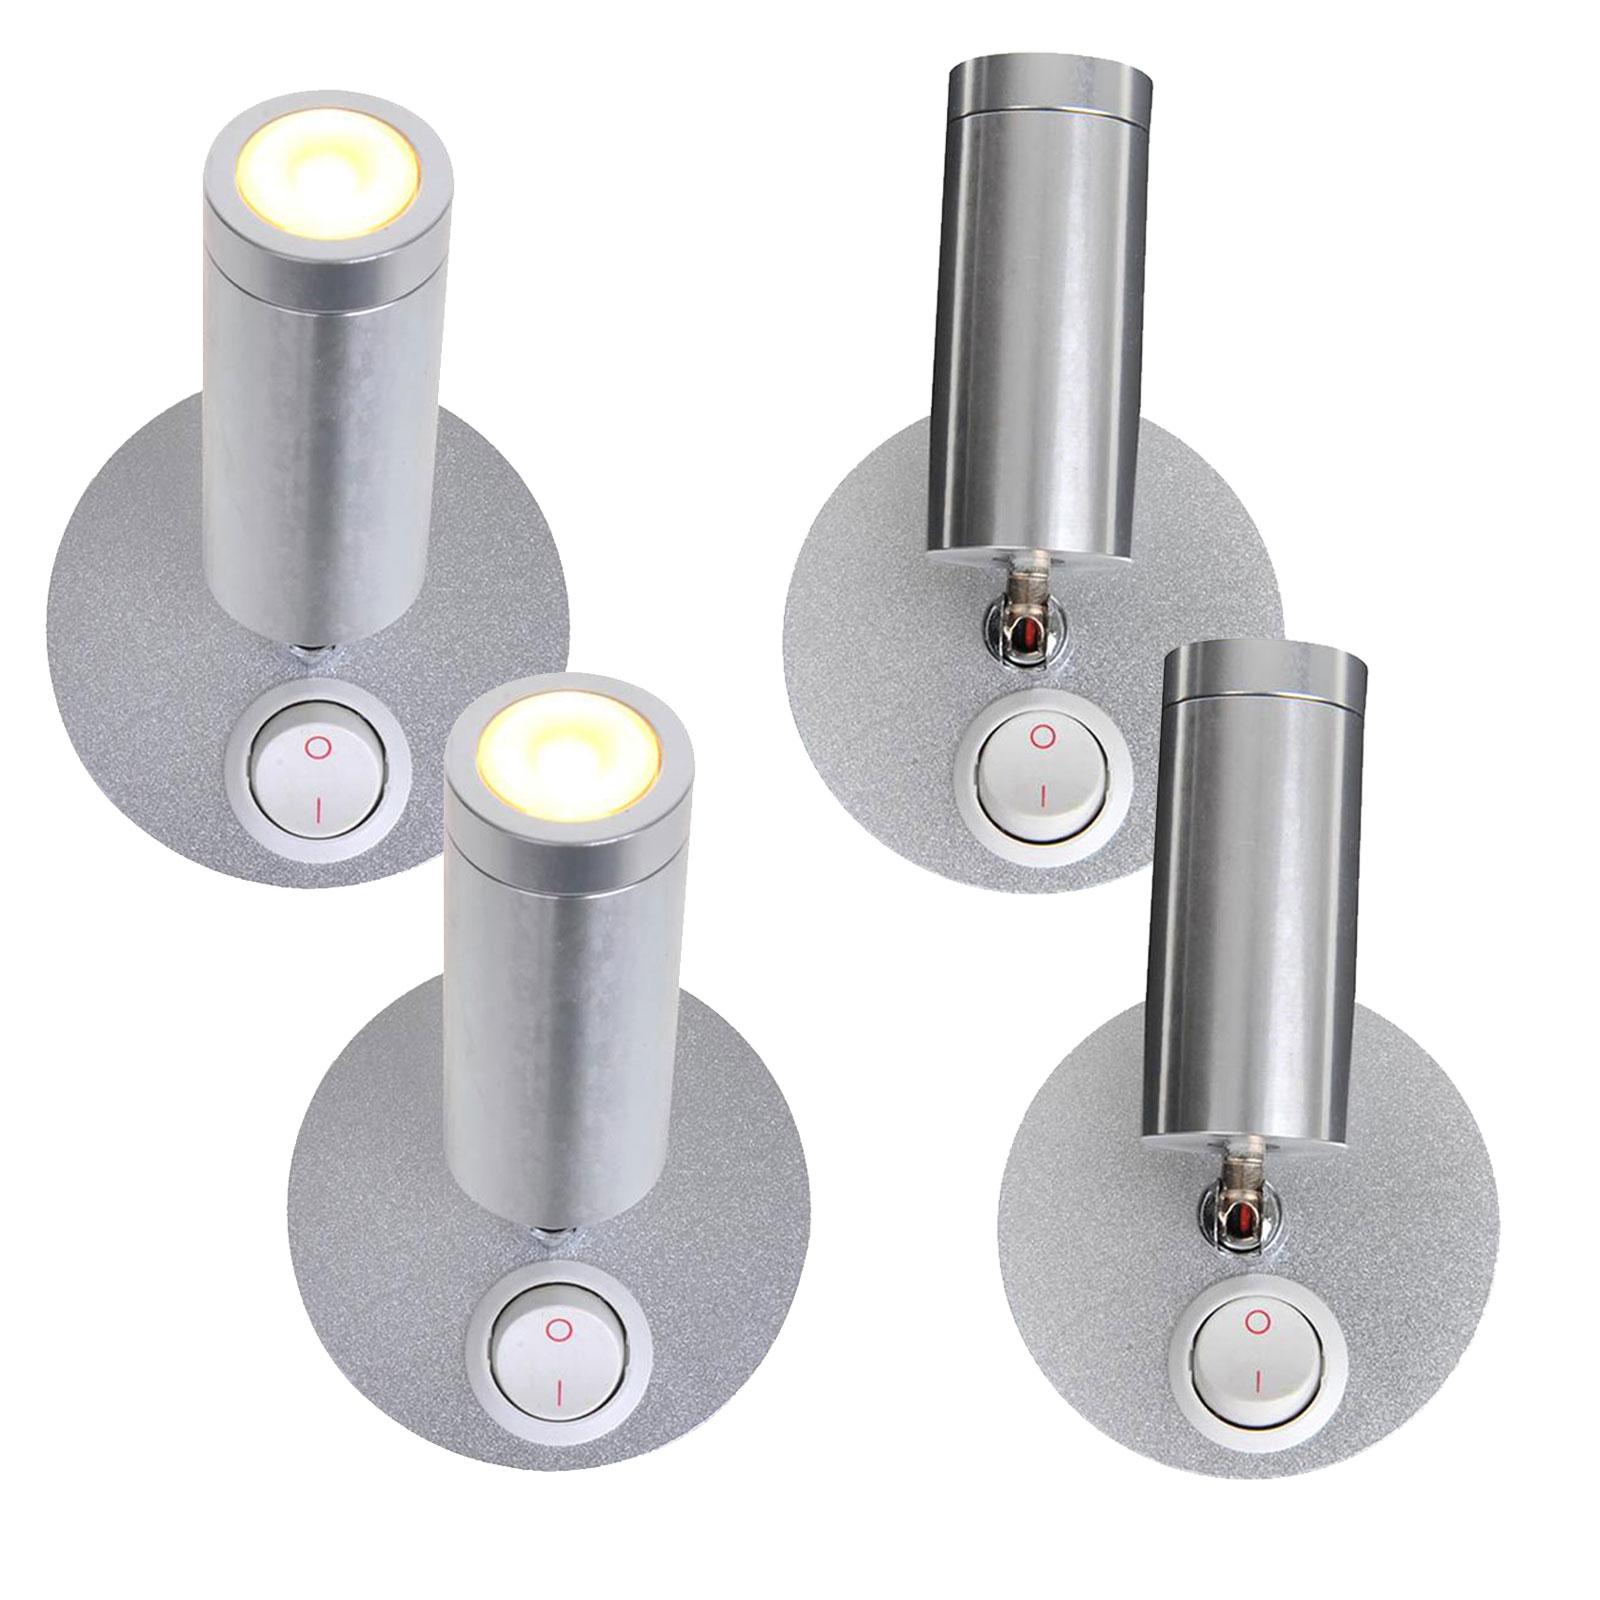 4er Set Aufbauspot 1 LED schwenkbar 12v, 120lm, Ø65x65-130mm